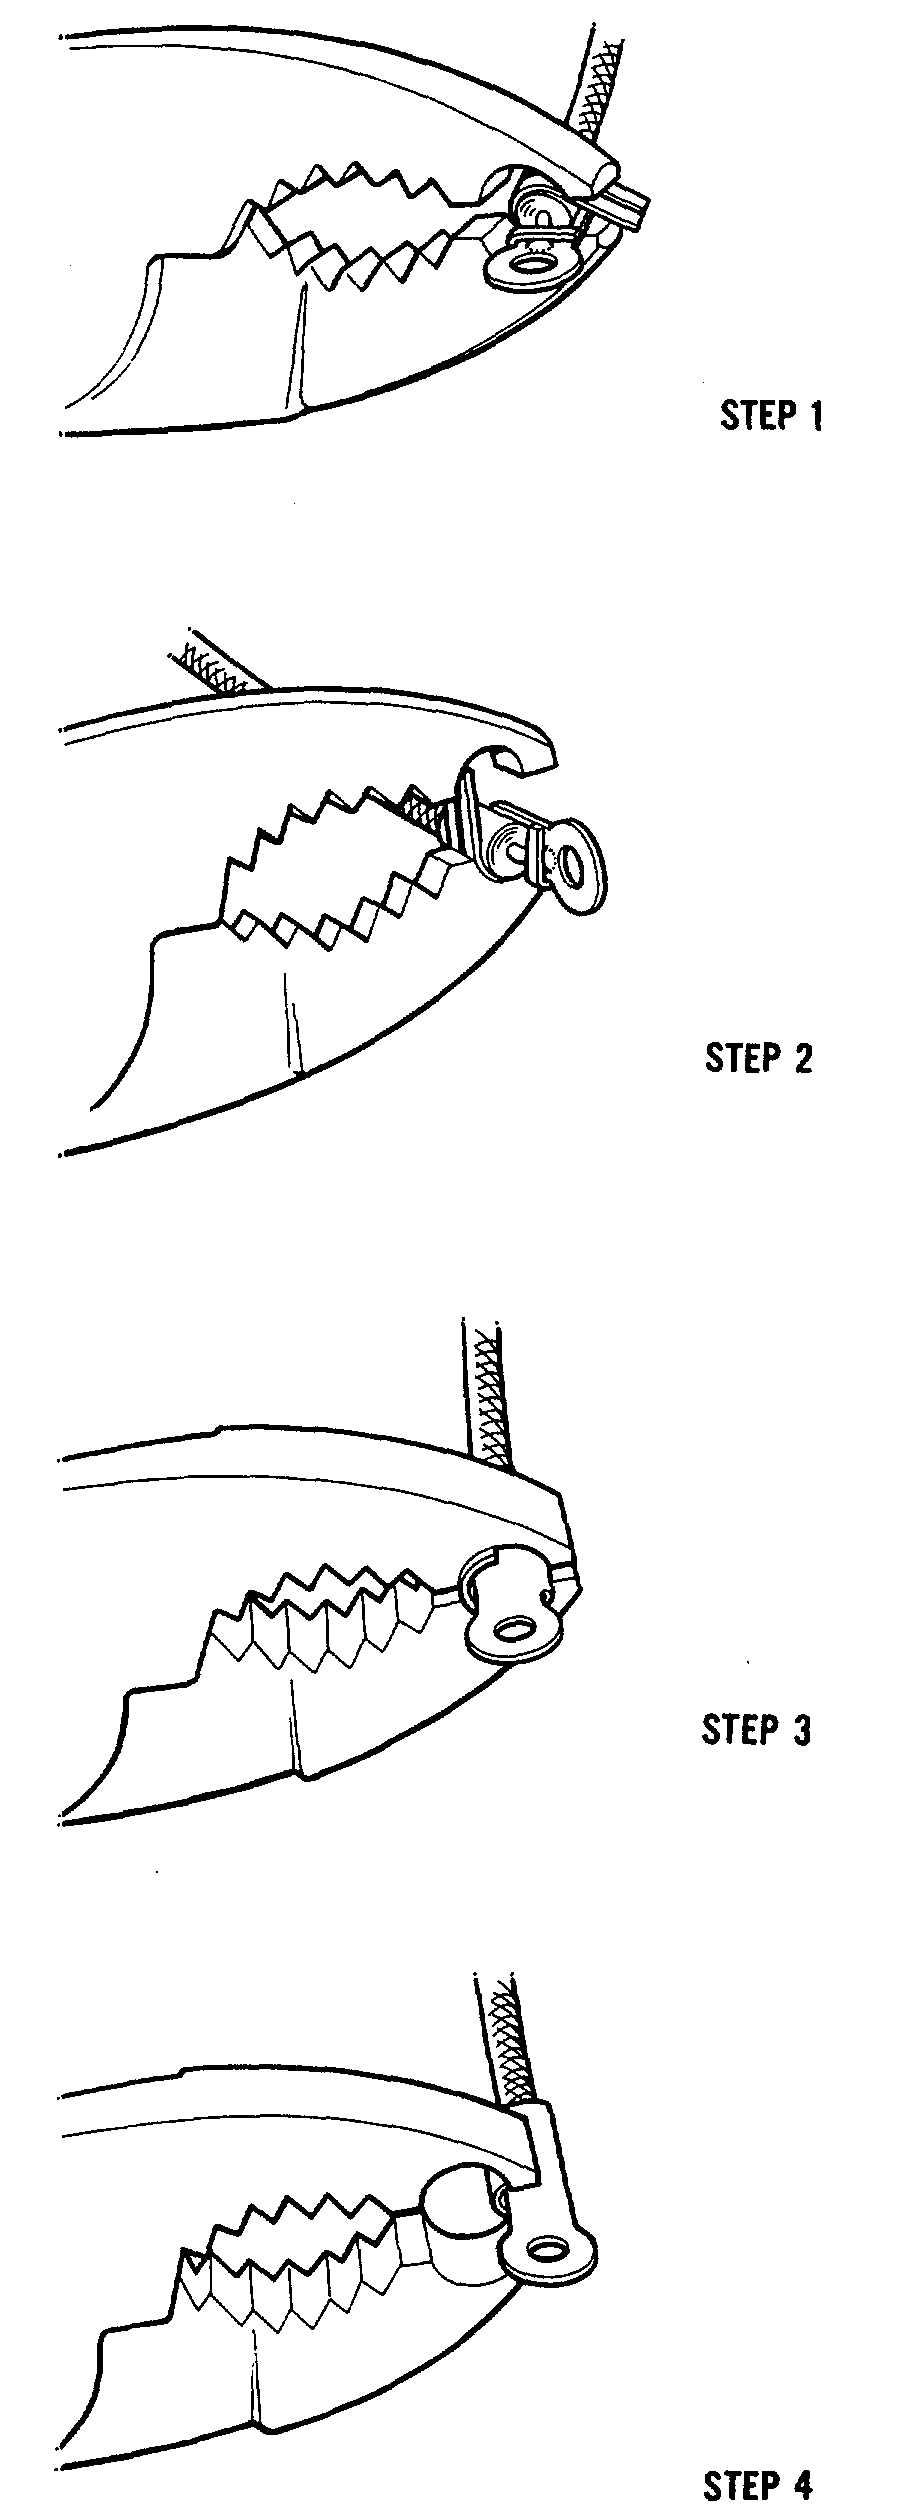 thermocouple harness